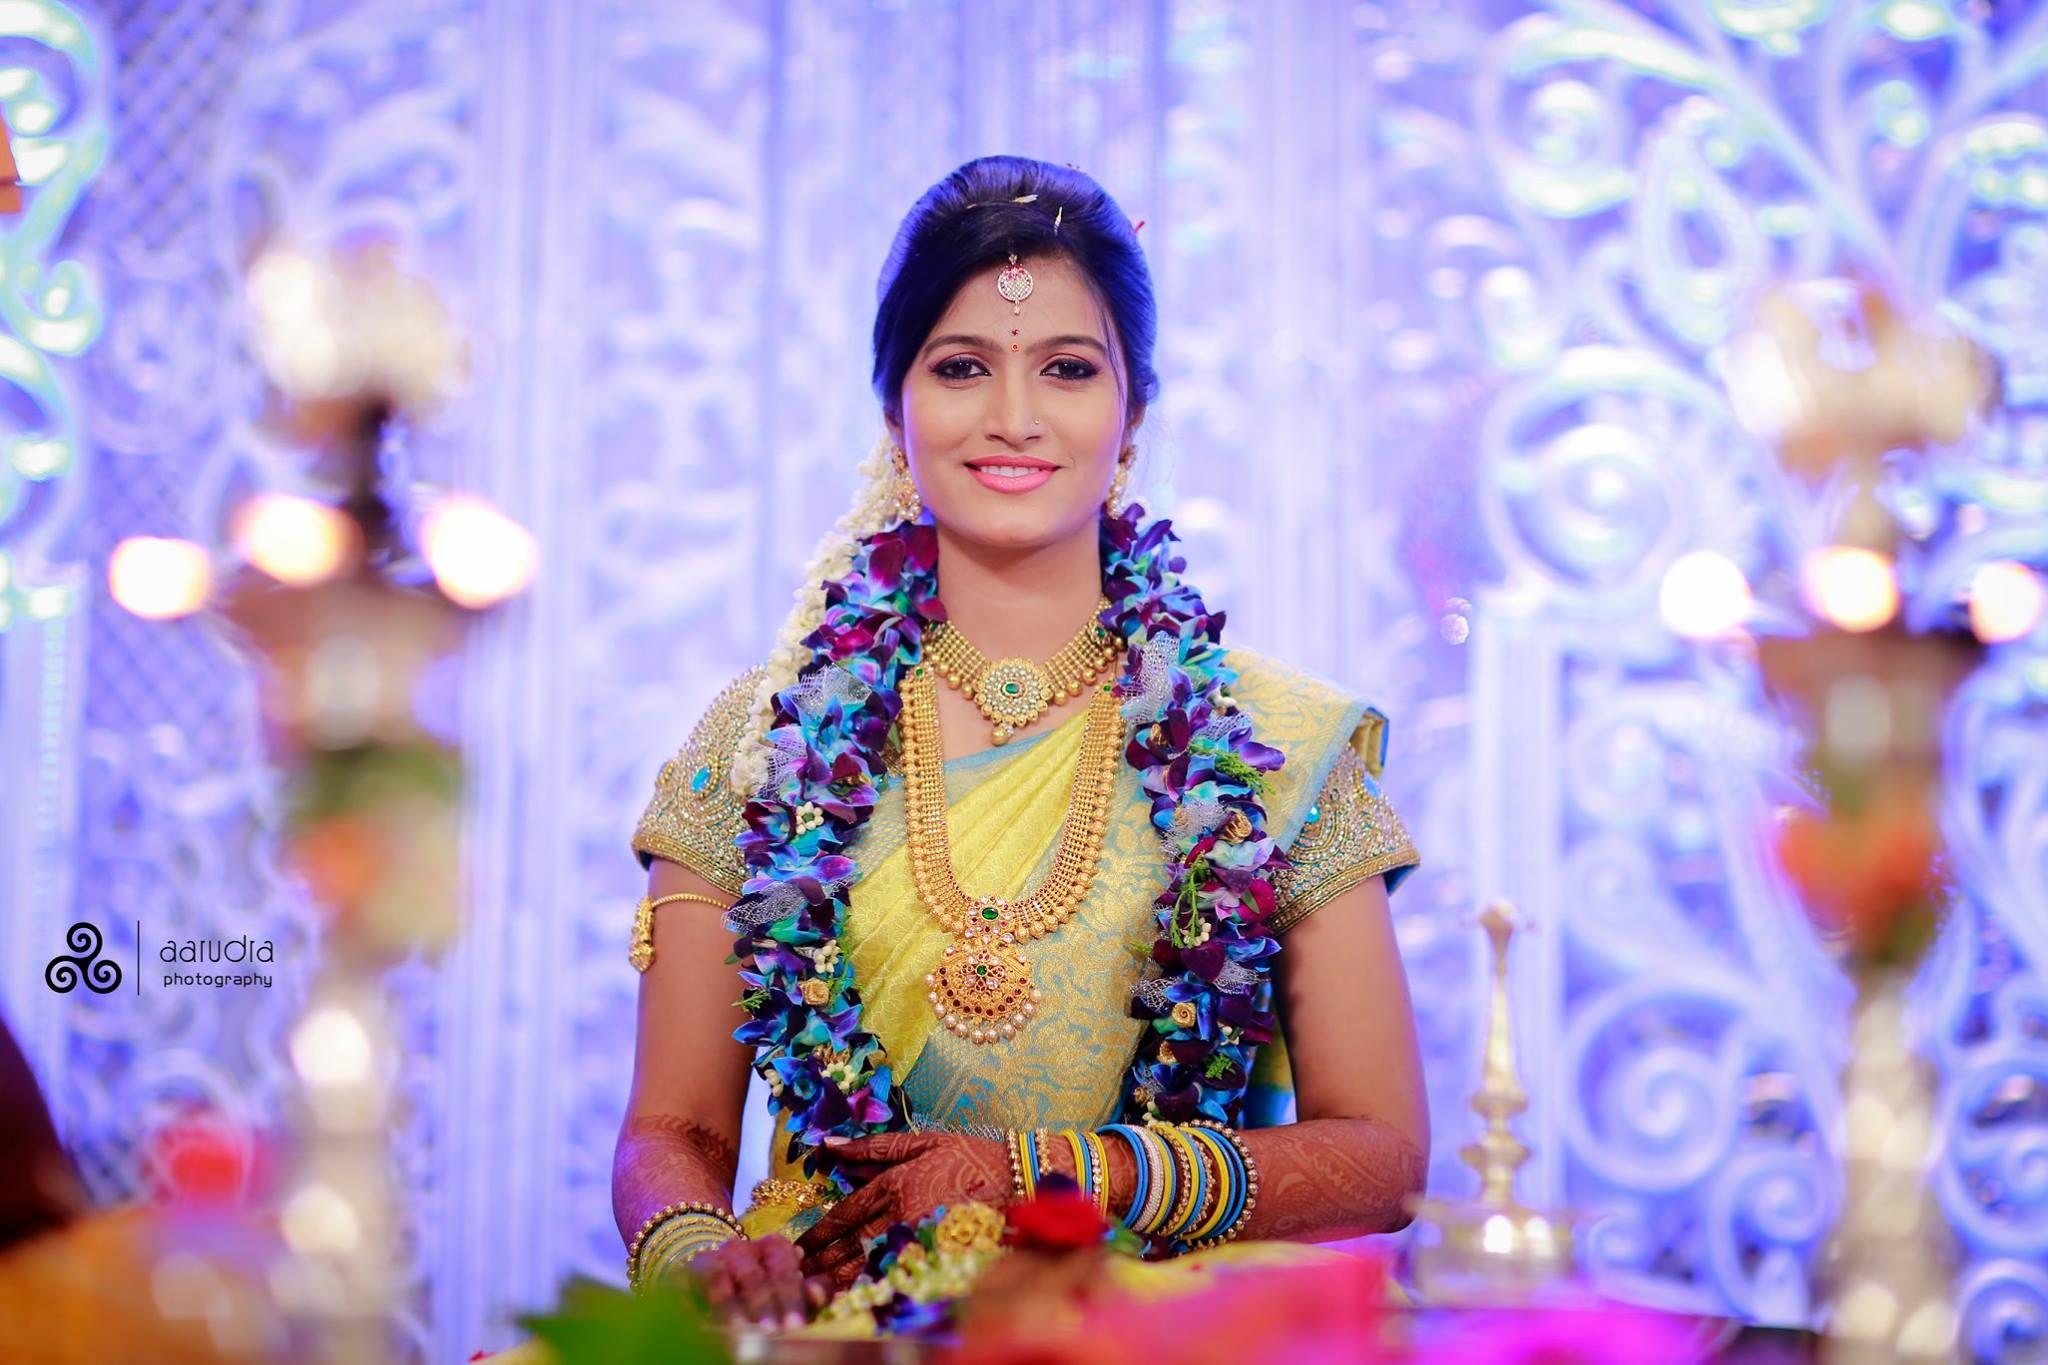 Blue And Violet Floweral Wedding Garland Indian Wedding Garland Indian Wedding South Indian Bride